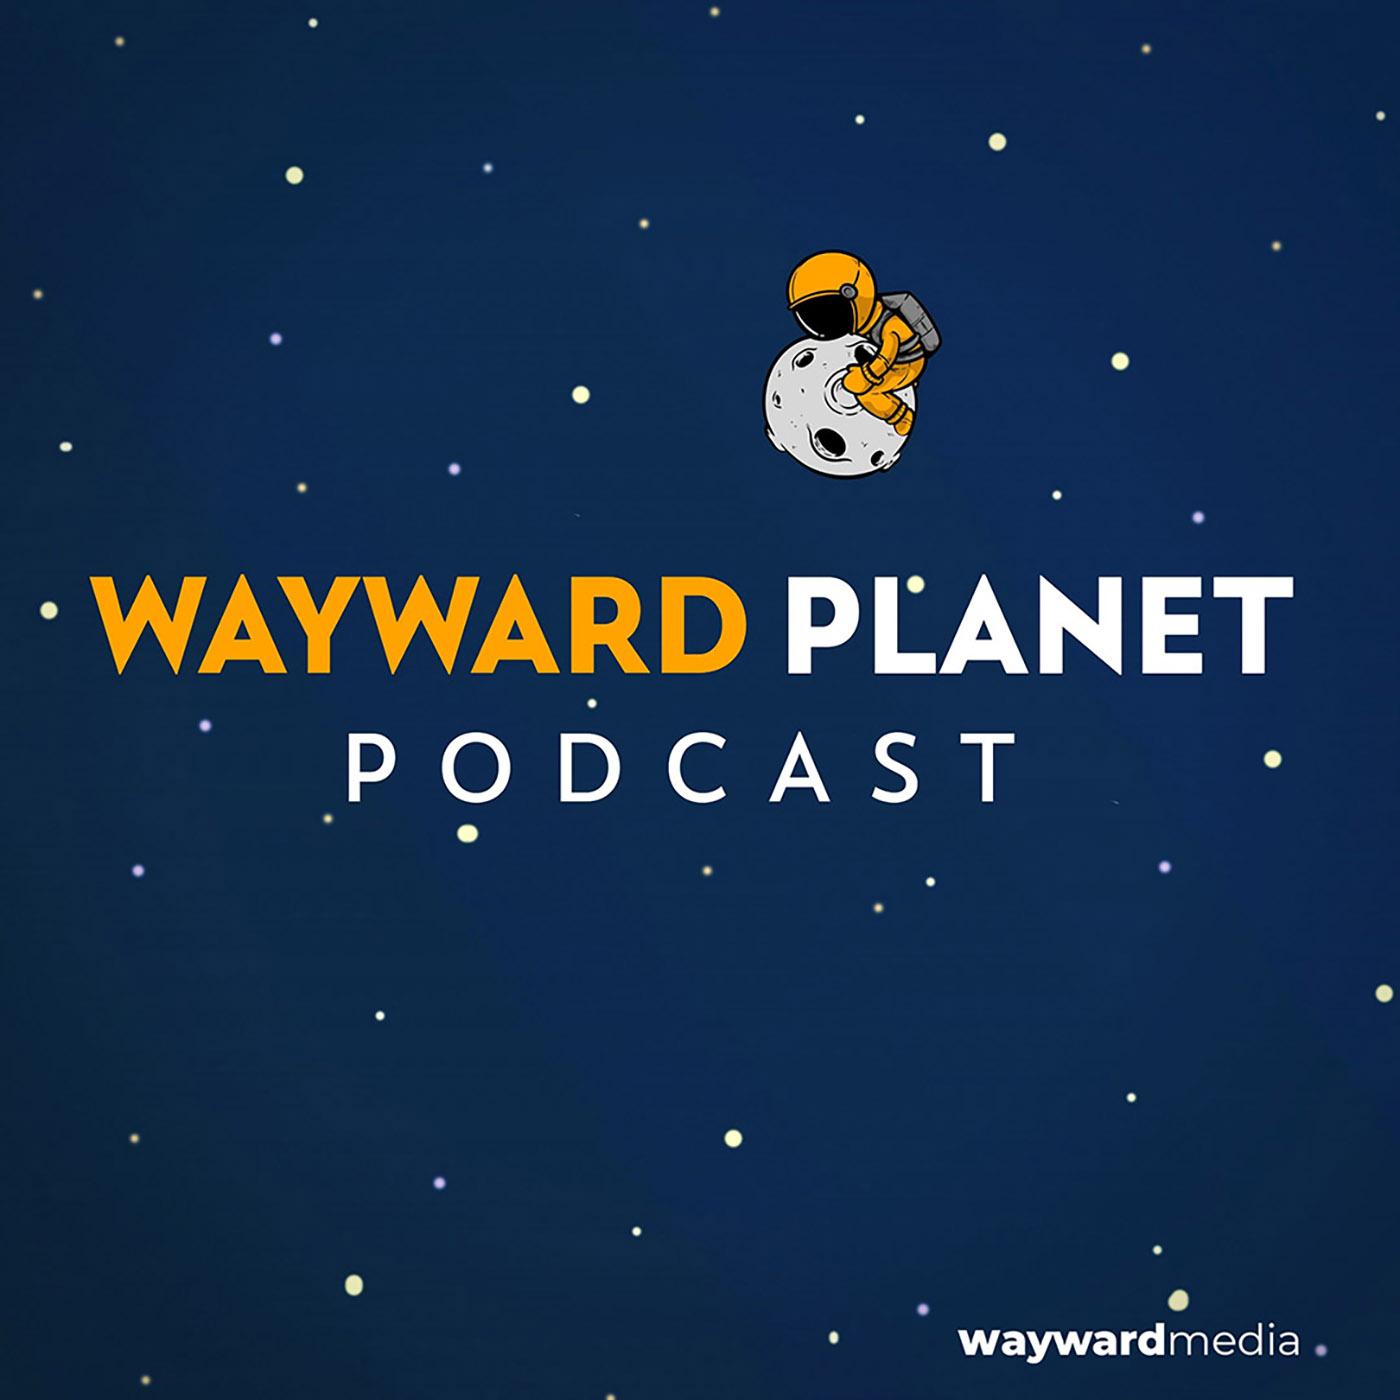 Show artwork for Wayward Planet